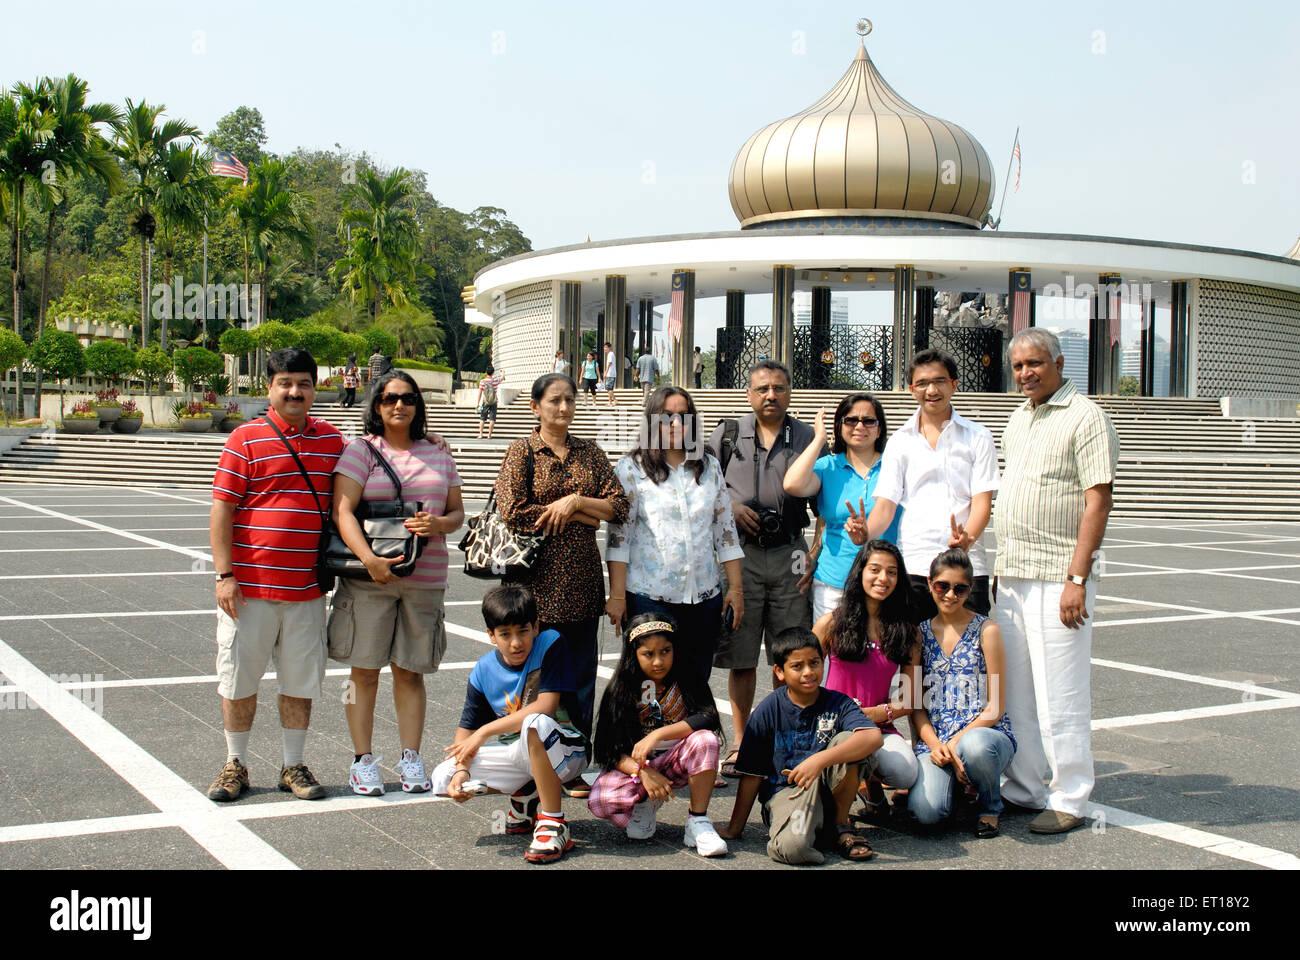 Indian family holiday vacation Jamek Mosque Kuala Lumpur Malaysia MR#364 - Stock Image